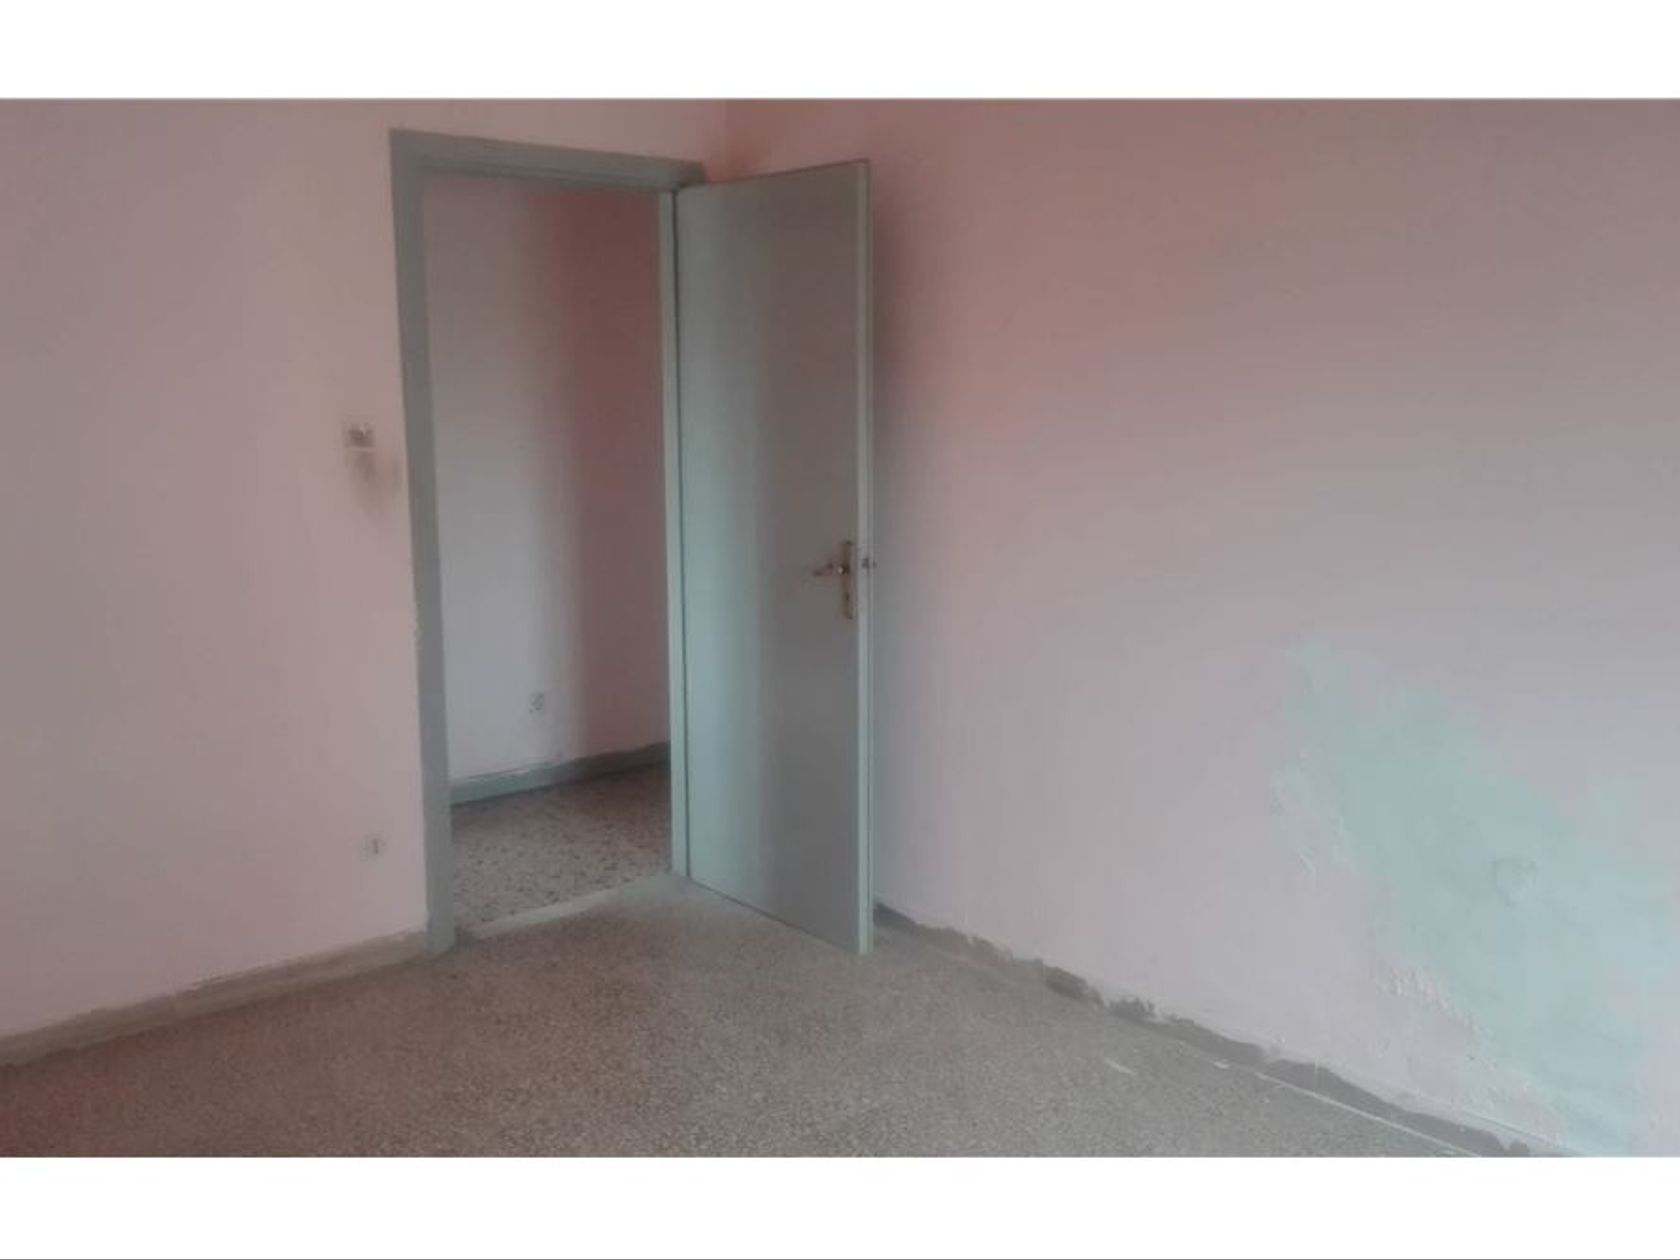 Appartamento Santa Maria, Catanzaro, CZ Vendita - Foto 16